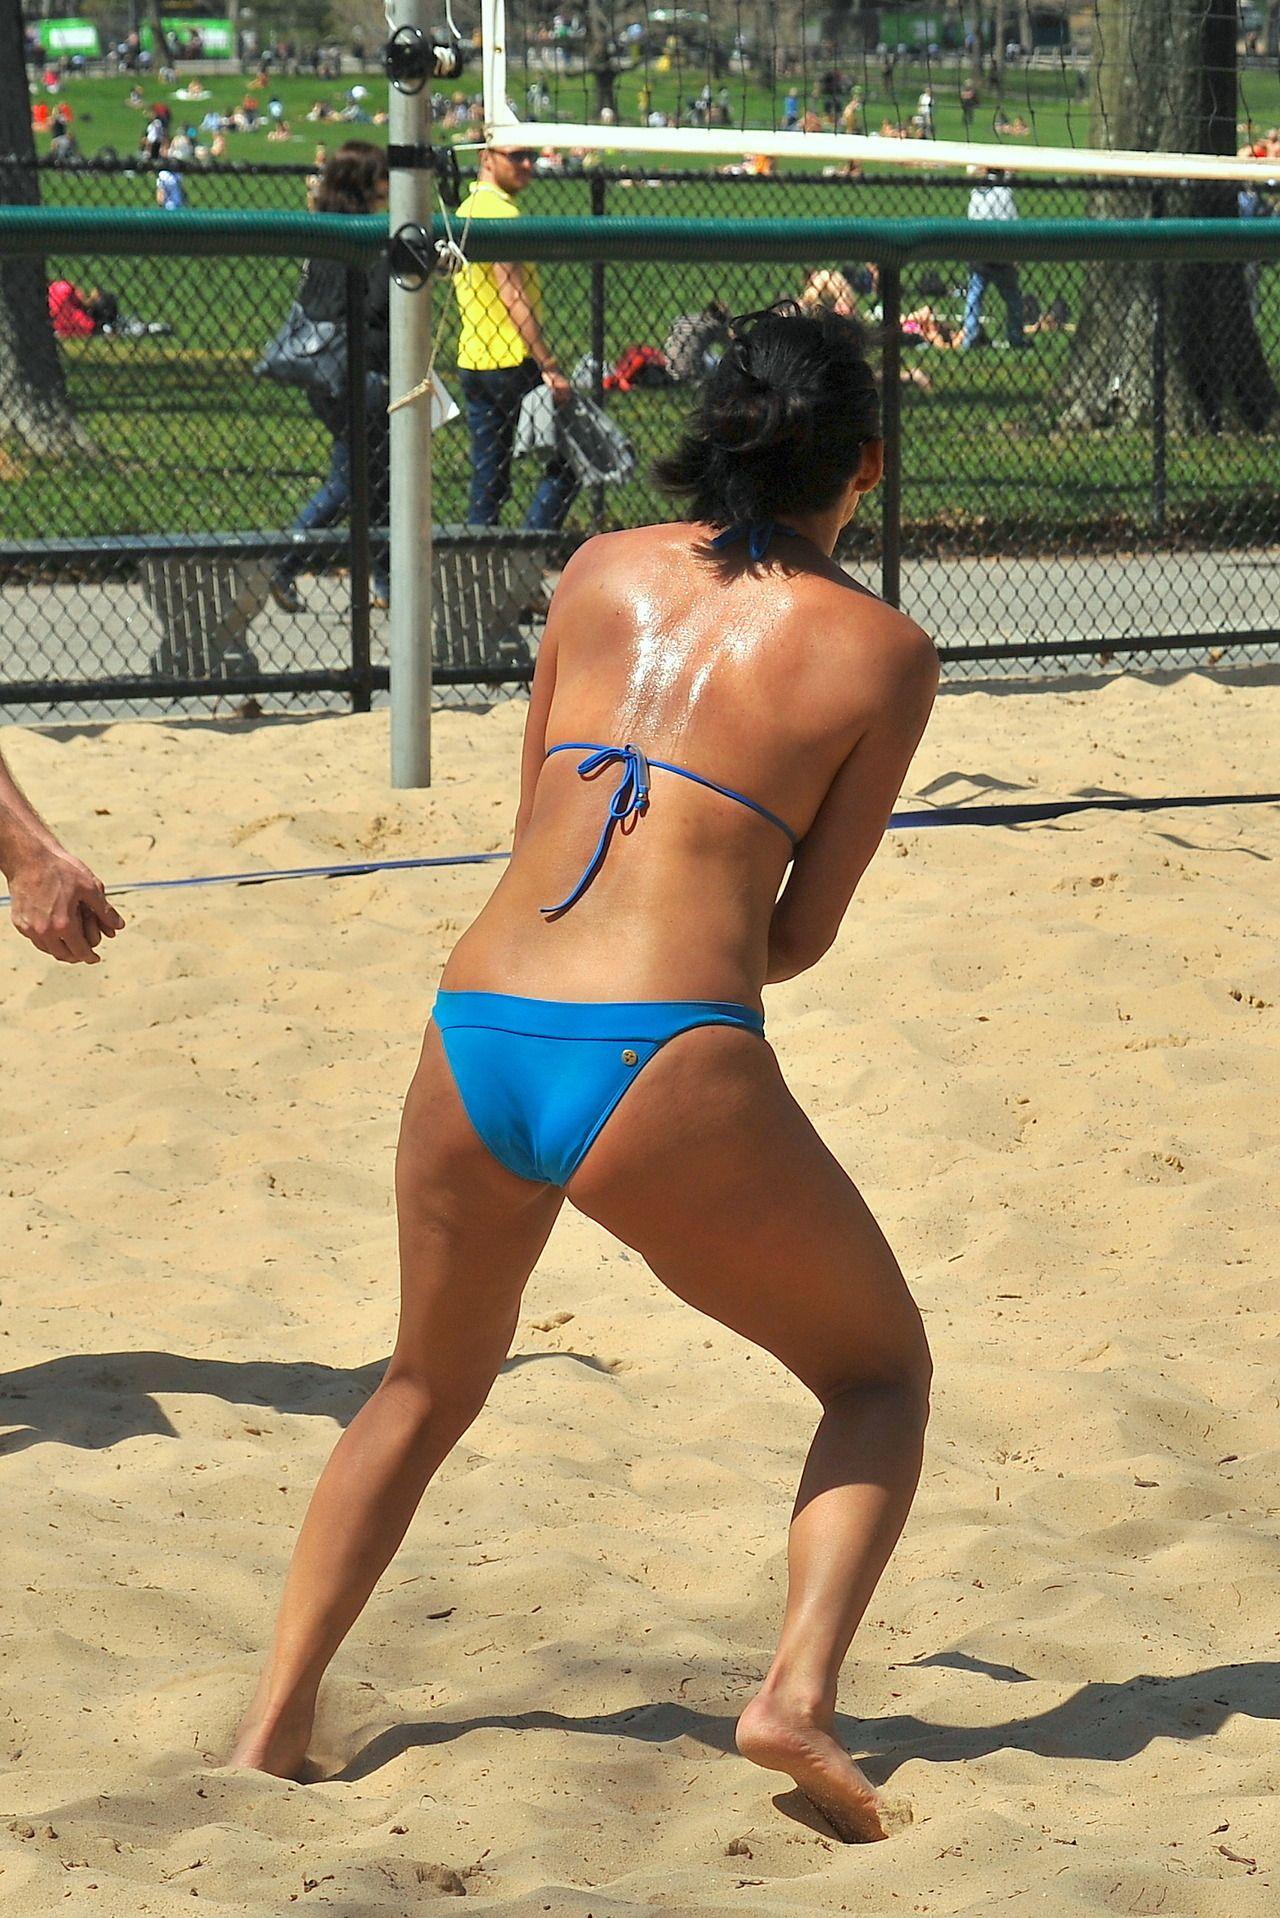 Beach Volleyball Tumblr Volleyball Tumblr Beach Volleyball Volleyball